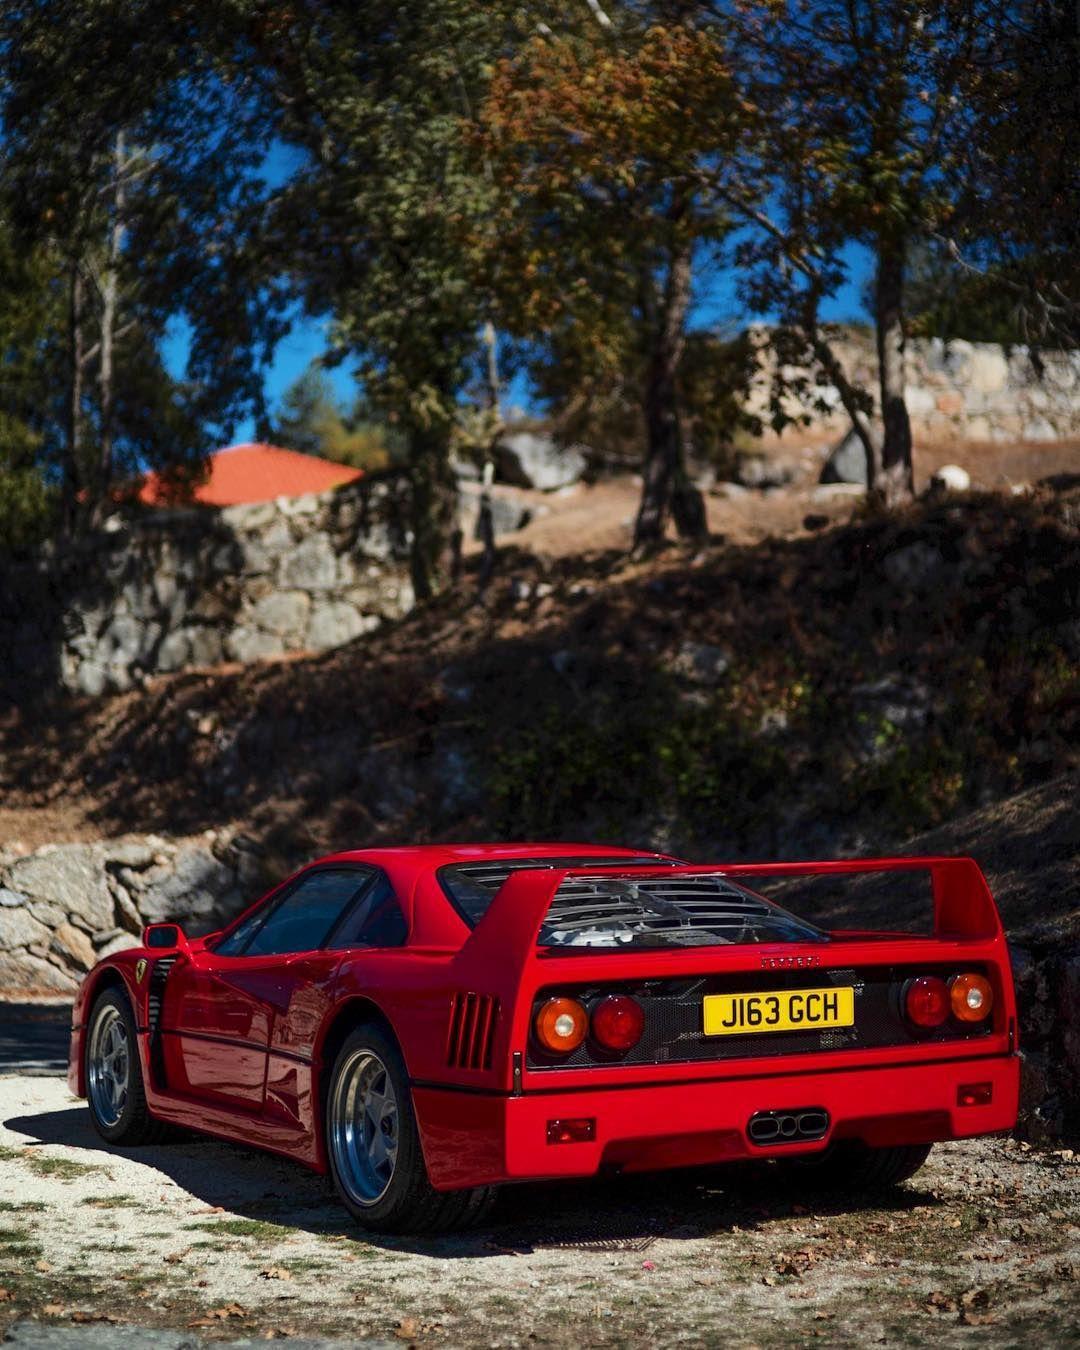 Ferrari F40: 22158828_1754715708155730_5113039470739849216_n.jpg (1080